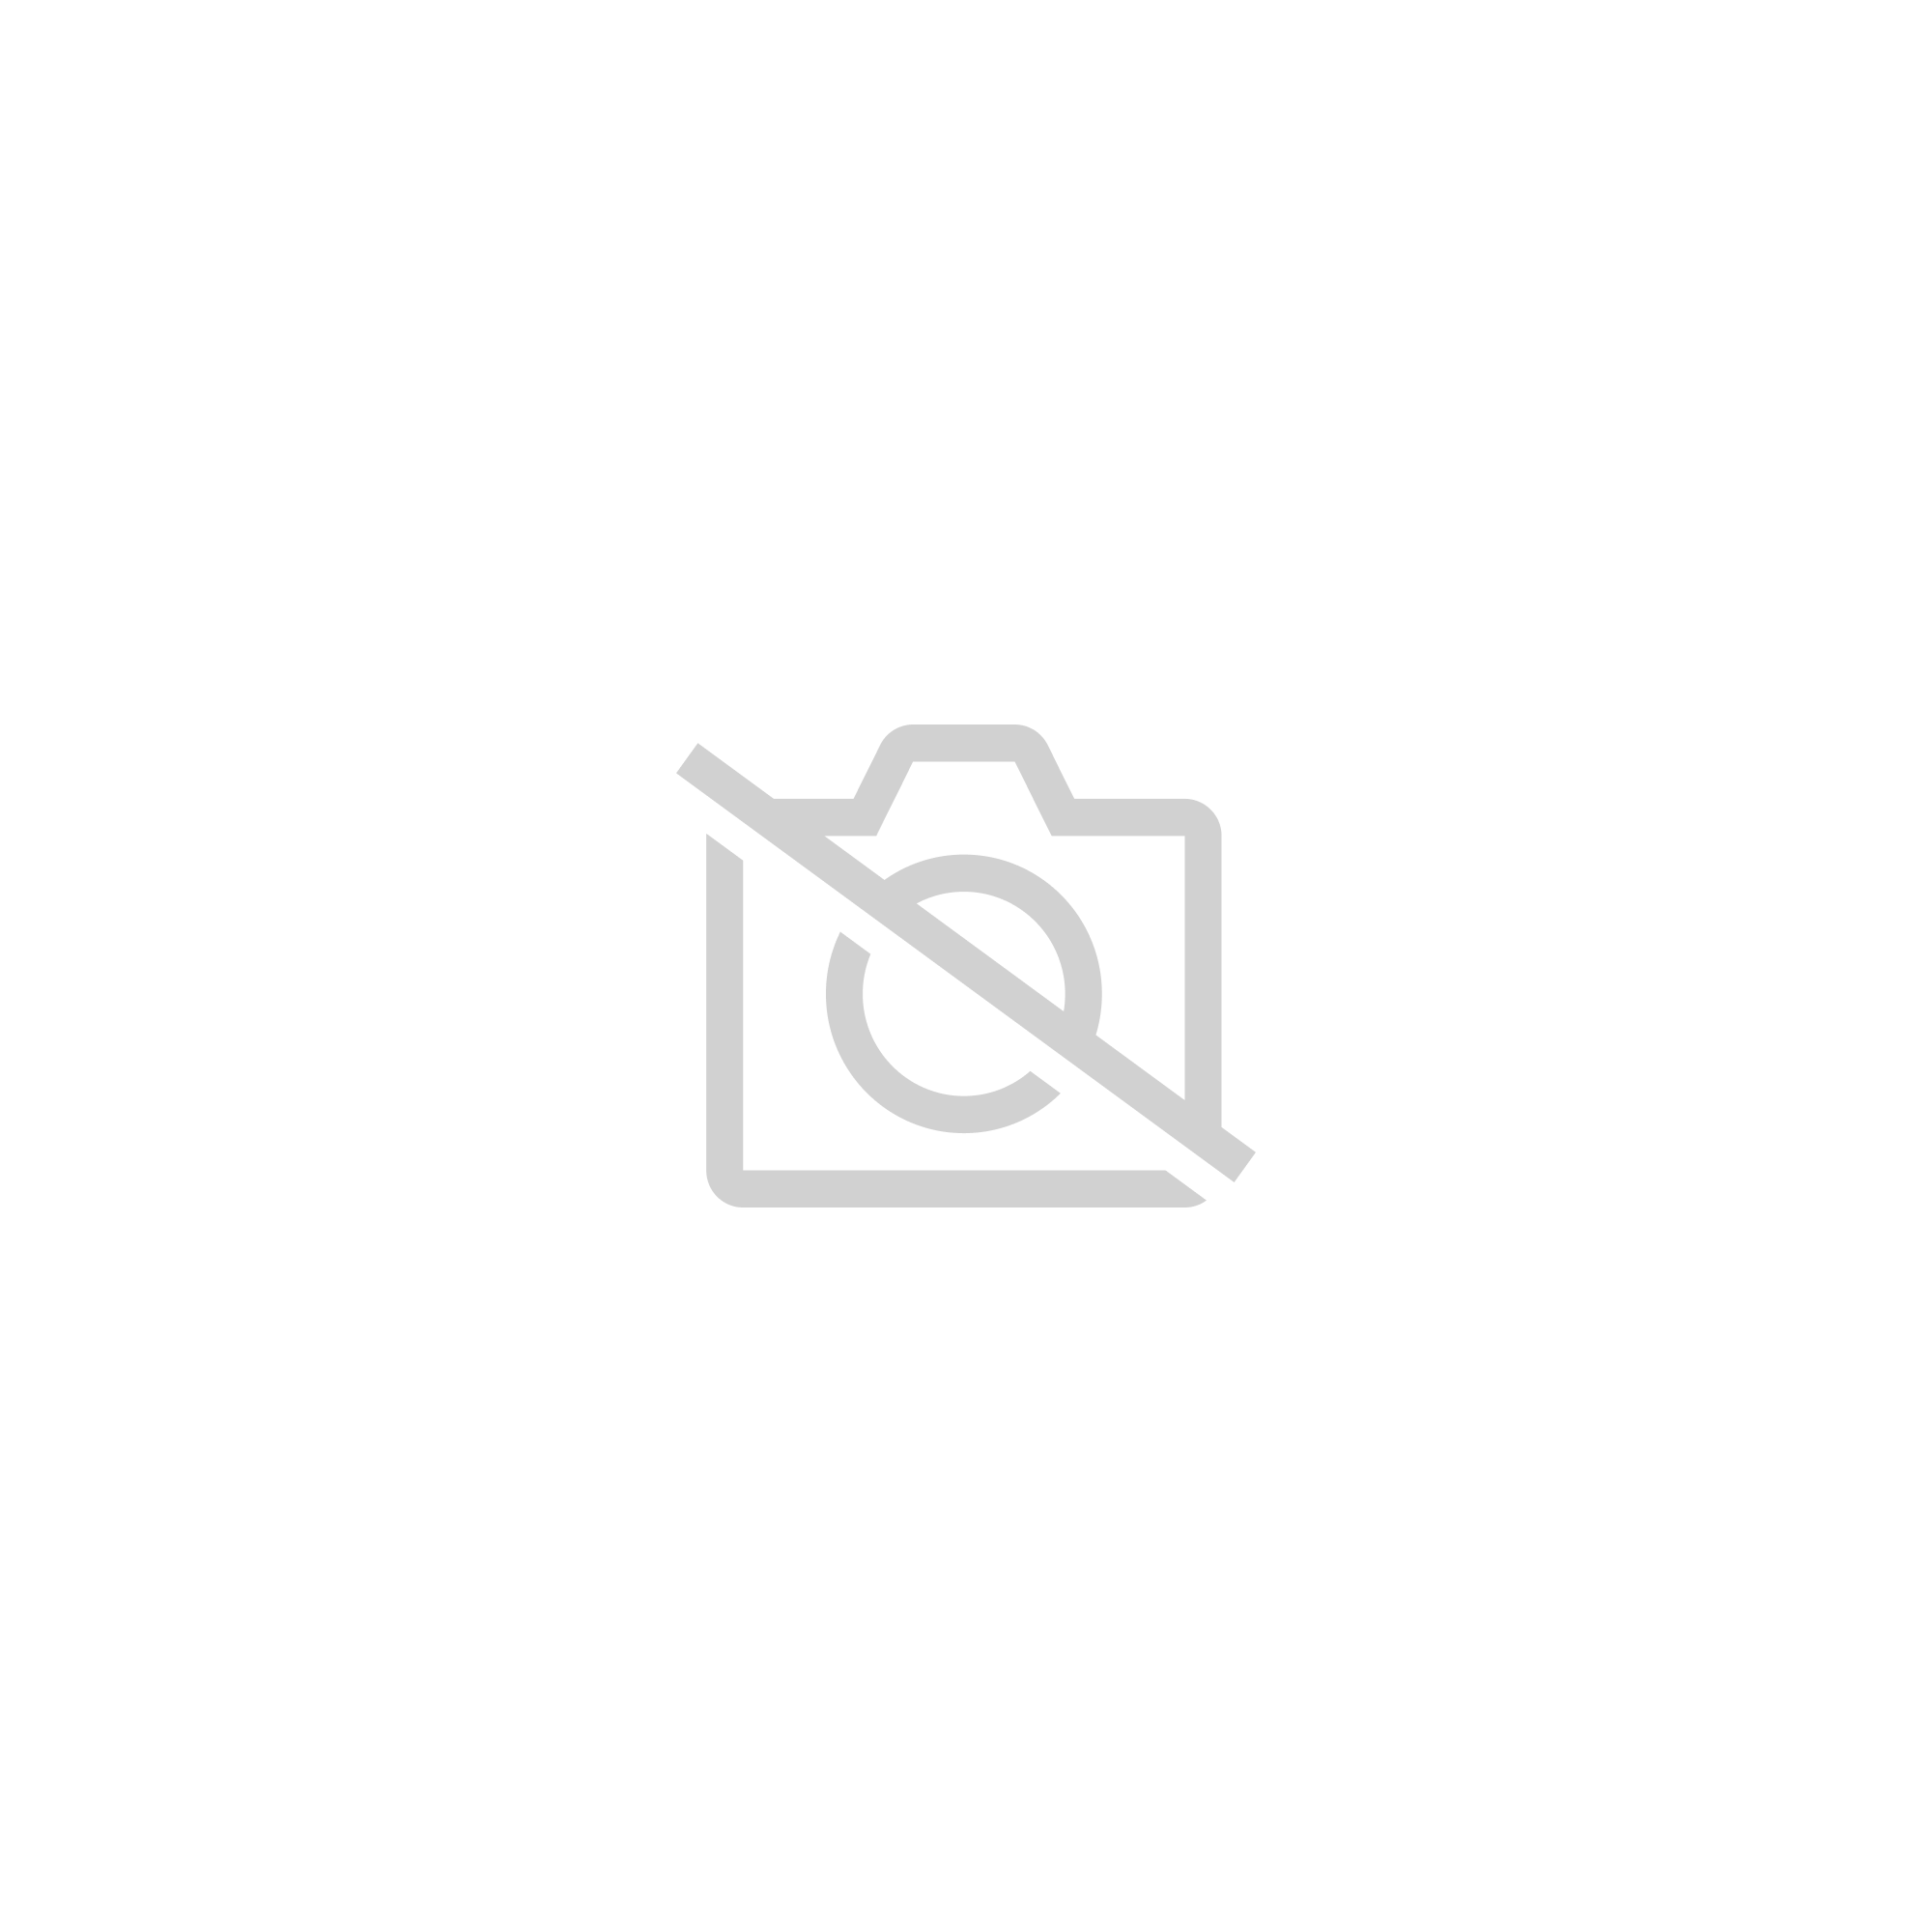 Chardonnerets tarins verdiers pinsons - EAN ANCIENNE EDITION MAJ MASSE